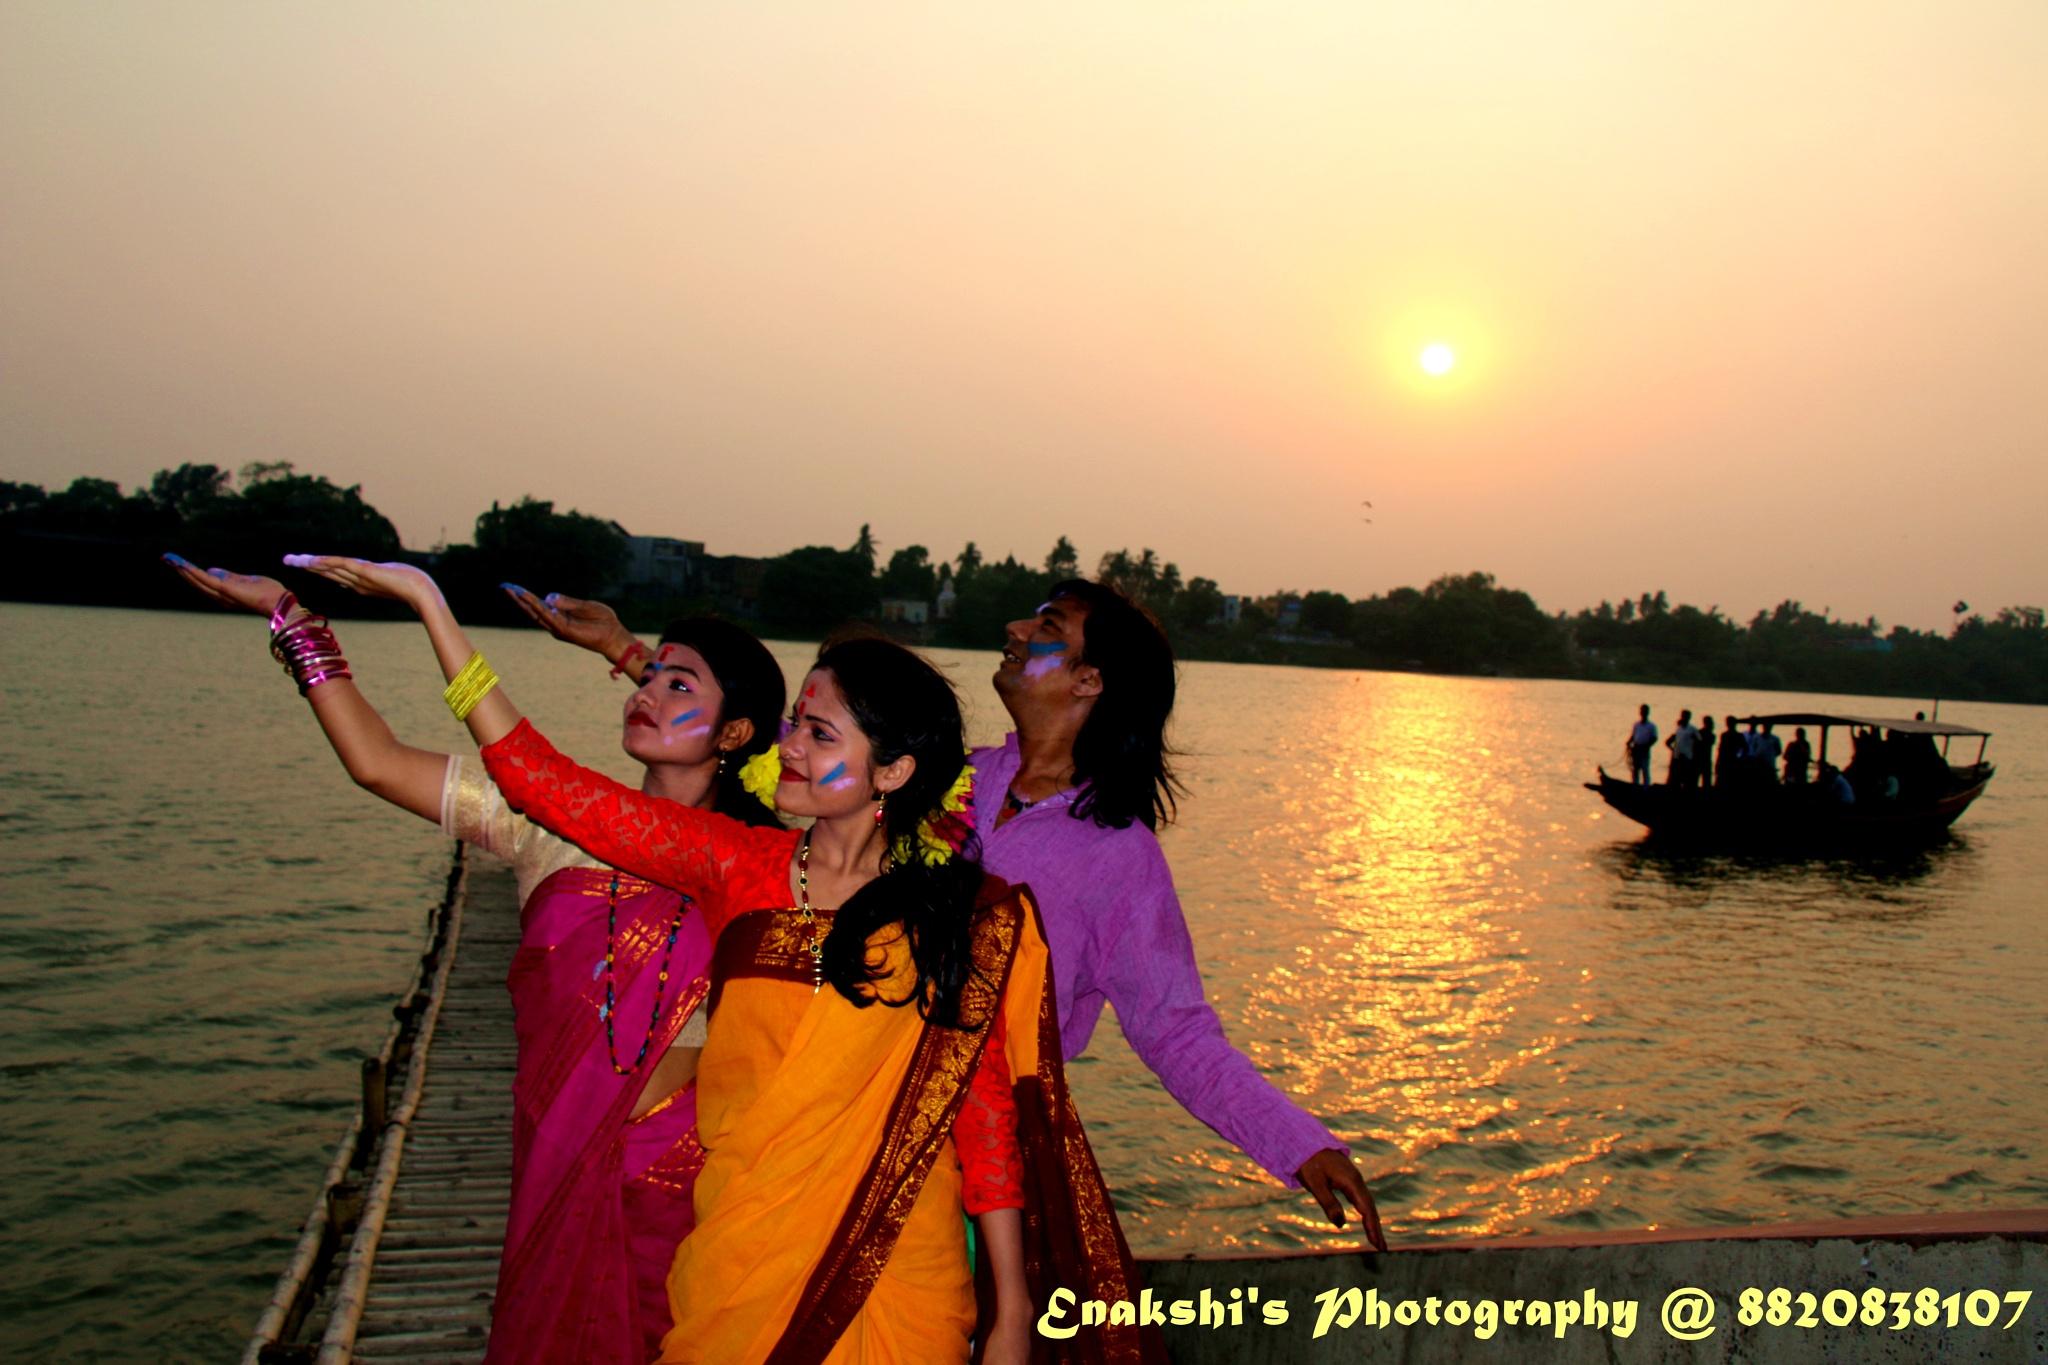 Basant Utsav D.O.P 21/03/2016 by Enakshi Banerjee